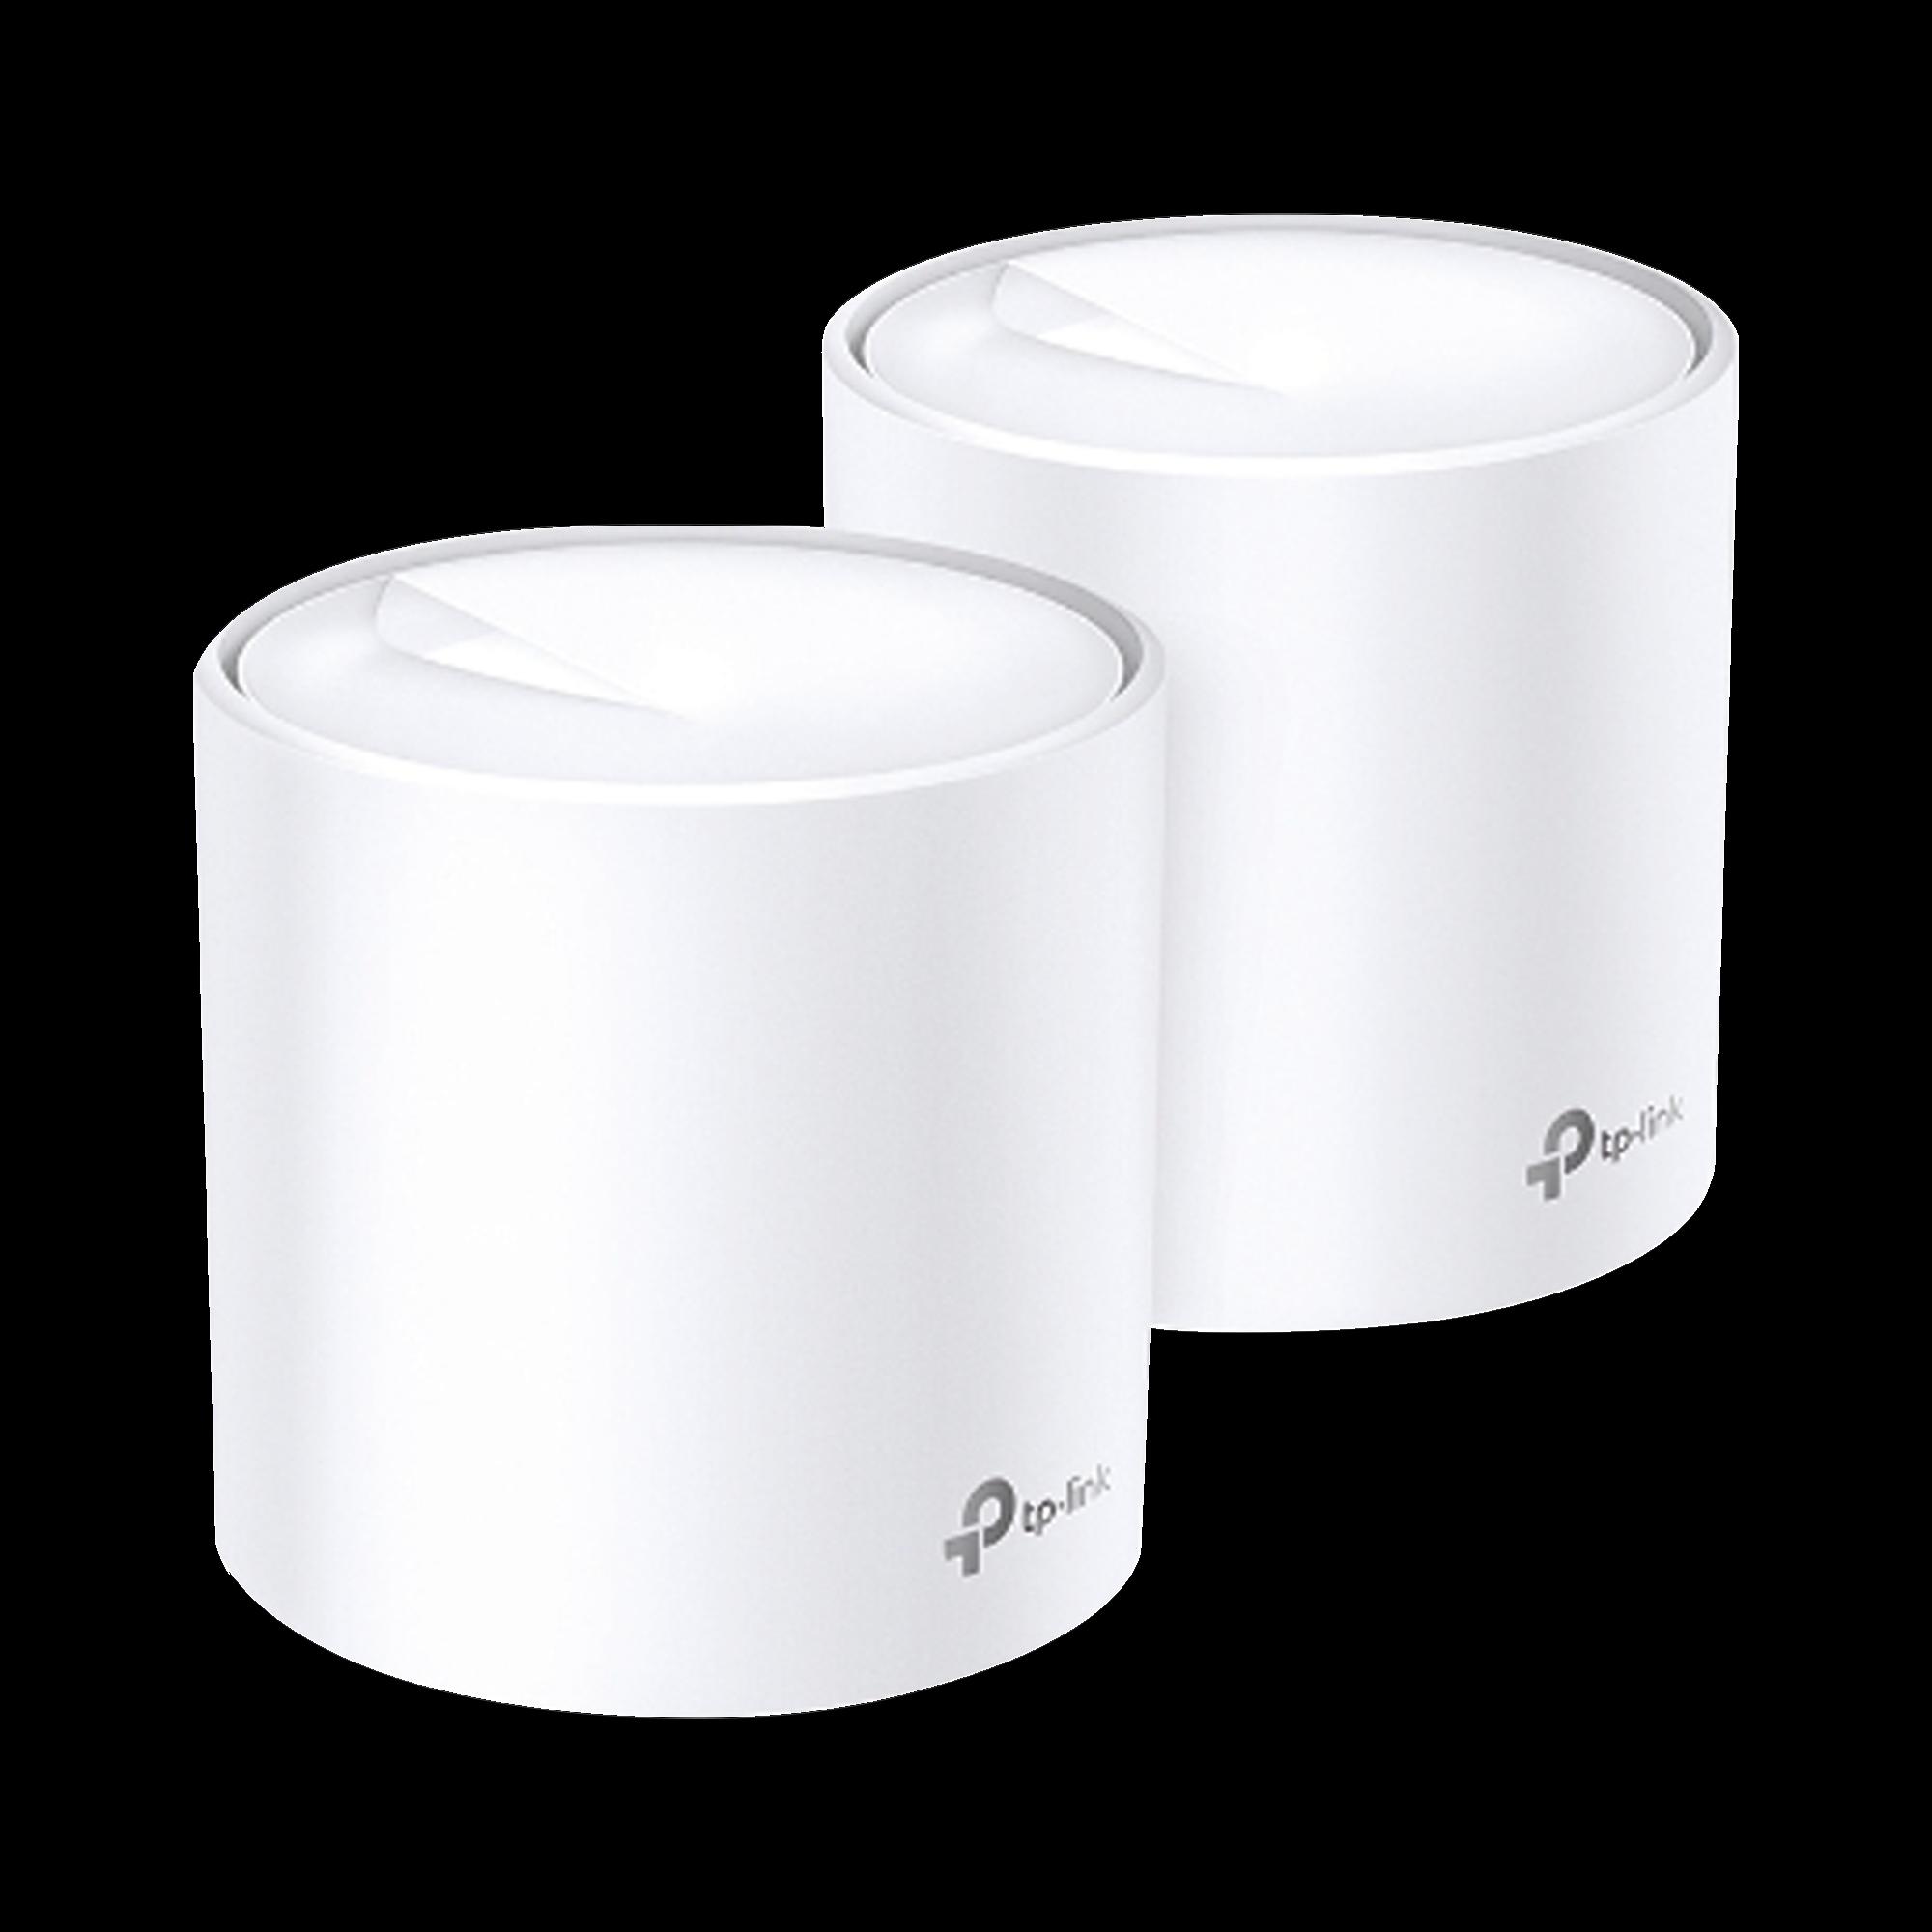 KIT de sistema inalámbrico Deco X20 mesh para hogar, doble banda Wi-Fi 6 (AX), doble puerto Gigabit, 4 antenas internas y compatible con amazon alexa